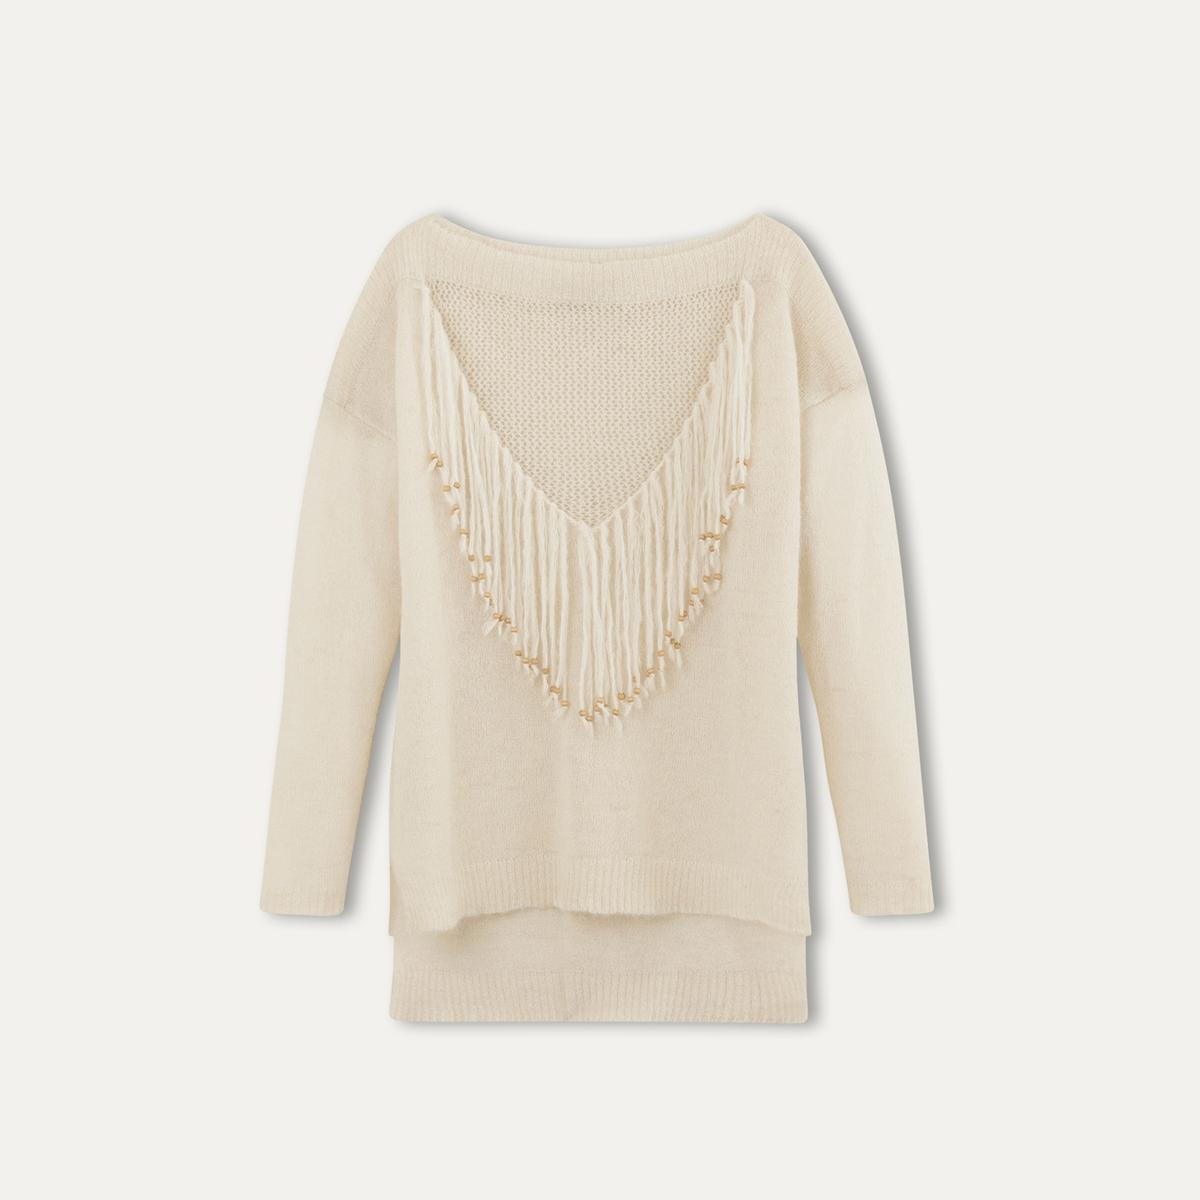 Пуловер женский AYOUNA